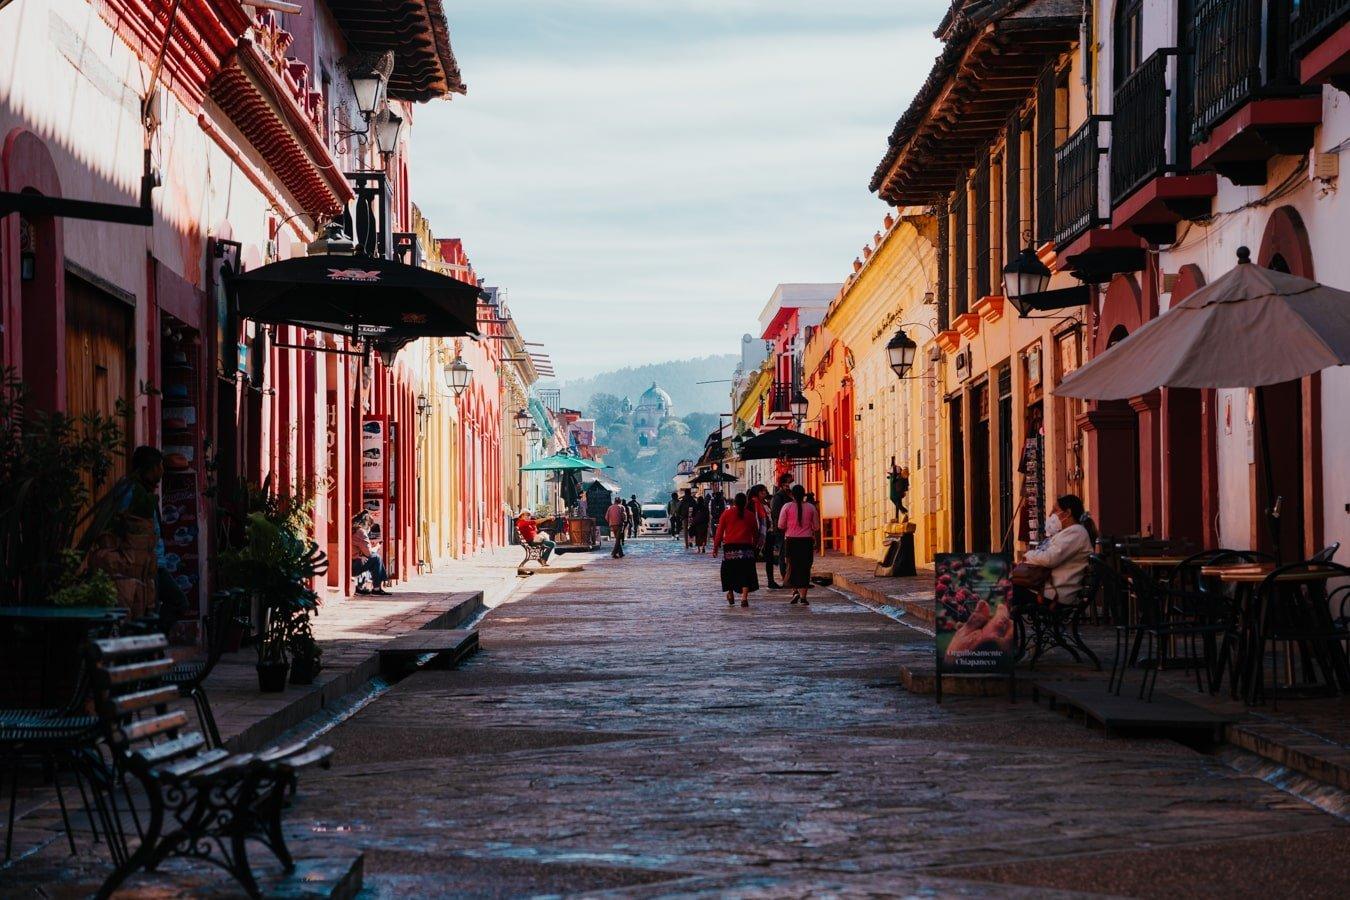 san cristobal de las casas real de guadalupe pedestrian street